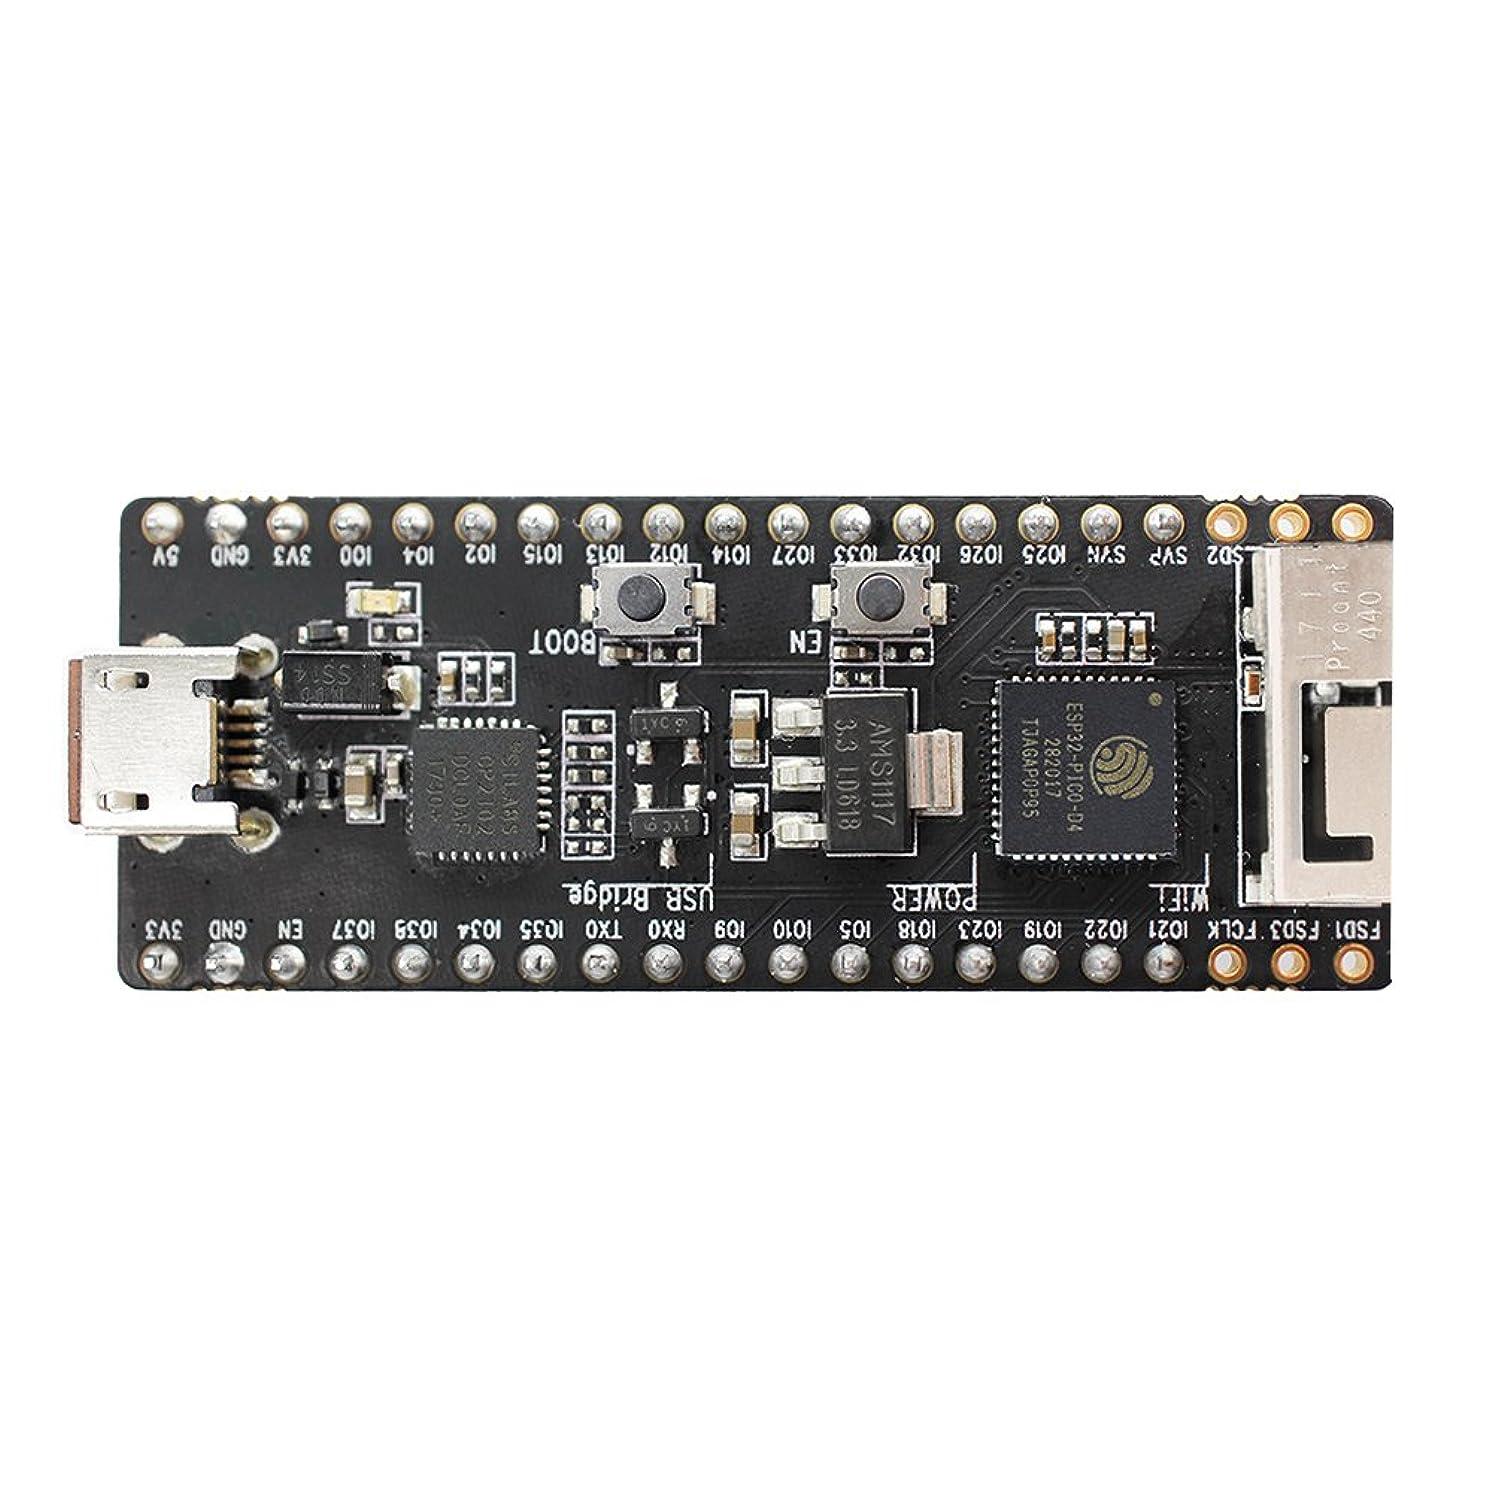 ESP32-PICO-KIT V4 Mini Development Board ESP32, WiFi Bluetooth ESP32-PICO-D4 40MHz Crystal USB-UART